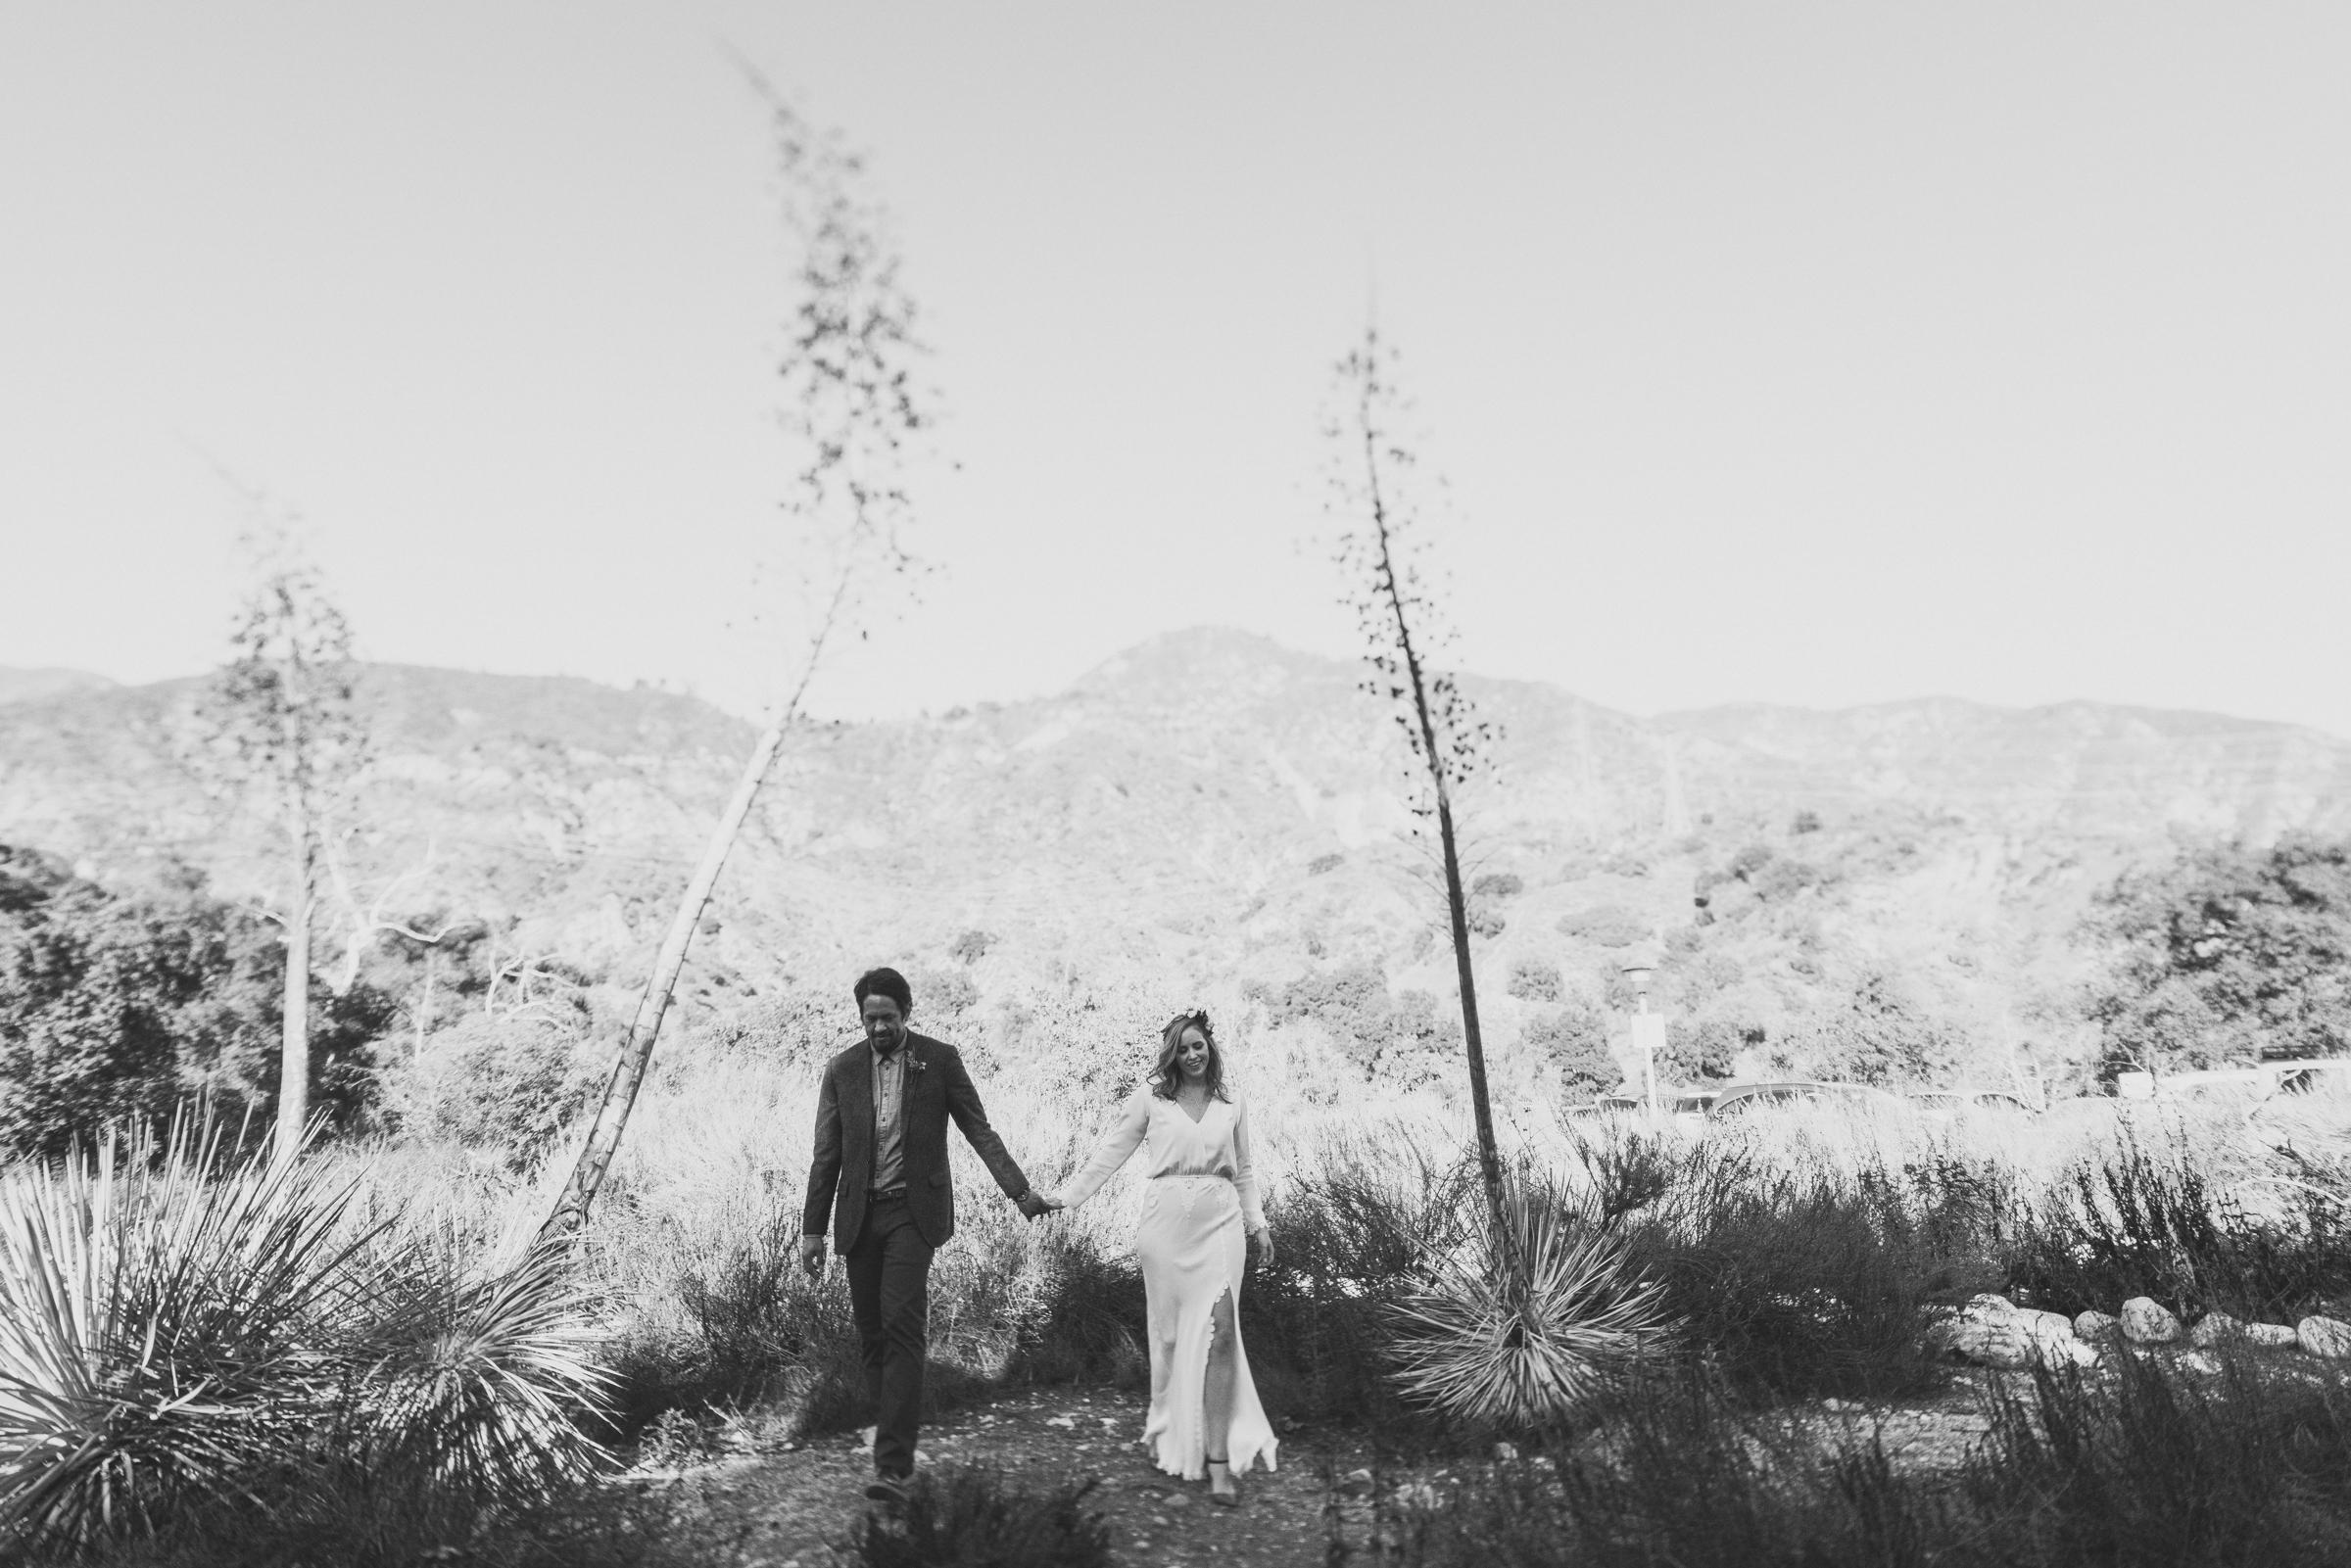 ©Isaiah + Taylor Photography - Intimate Elopement, Eaton Canyon, Los Angeles Wedding Photographer-32.jpg